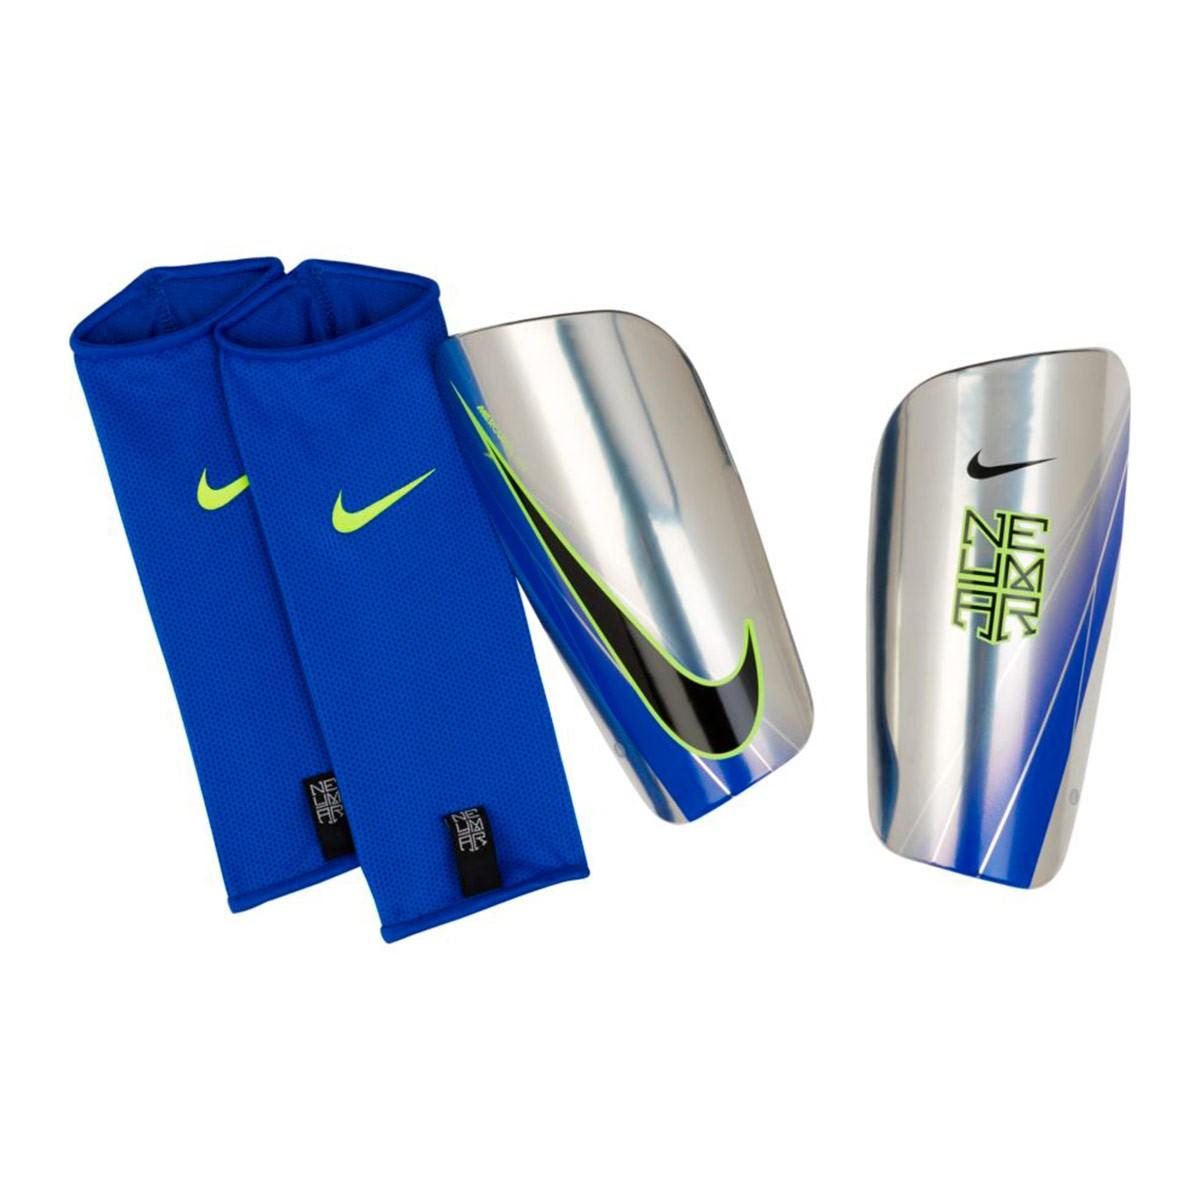 Espinillera Nike Neymar Mercurial Lite Football Chrome-Volt-Racer  blue-Black - Soloporteros es ahora Fútbol Emotion 7ee489146eab7